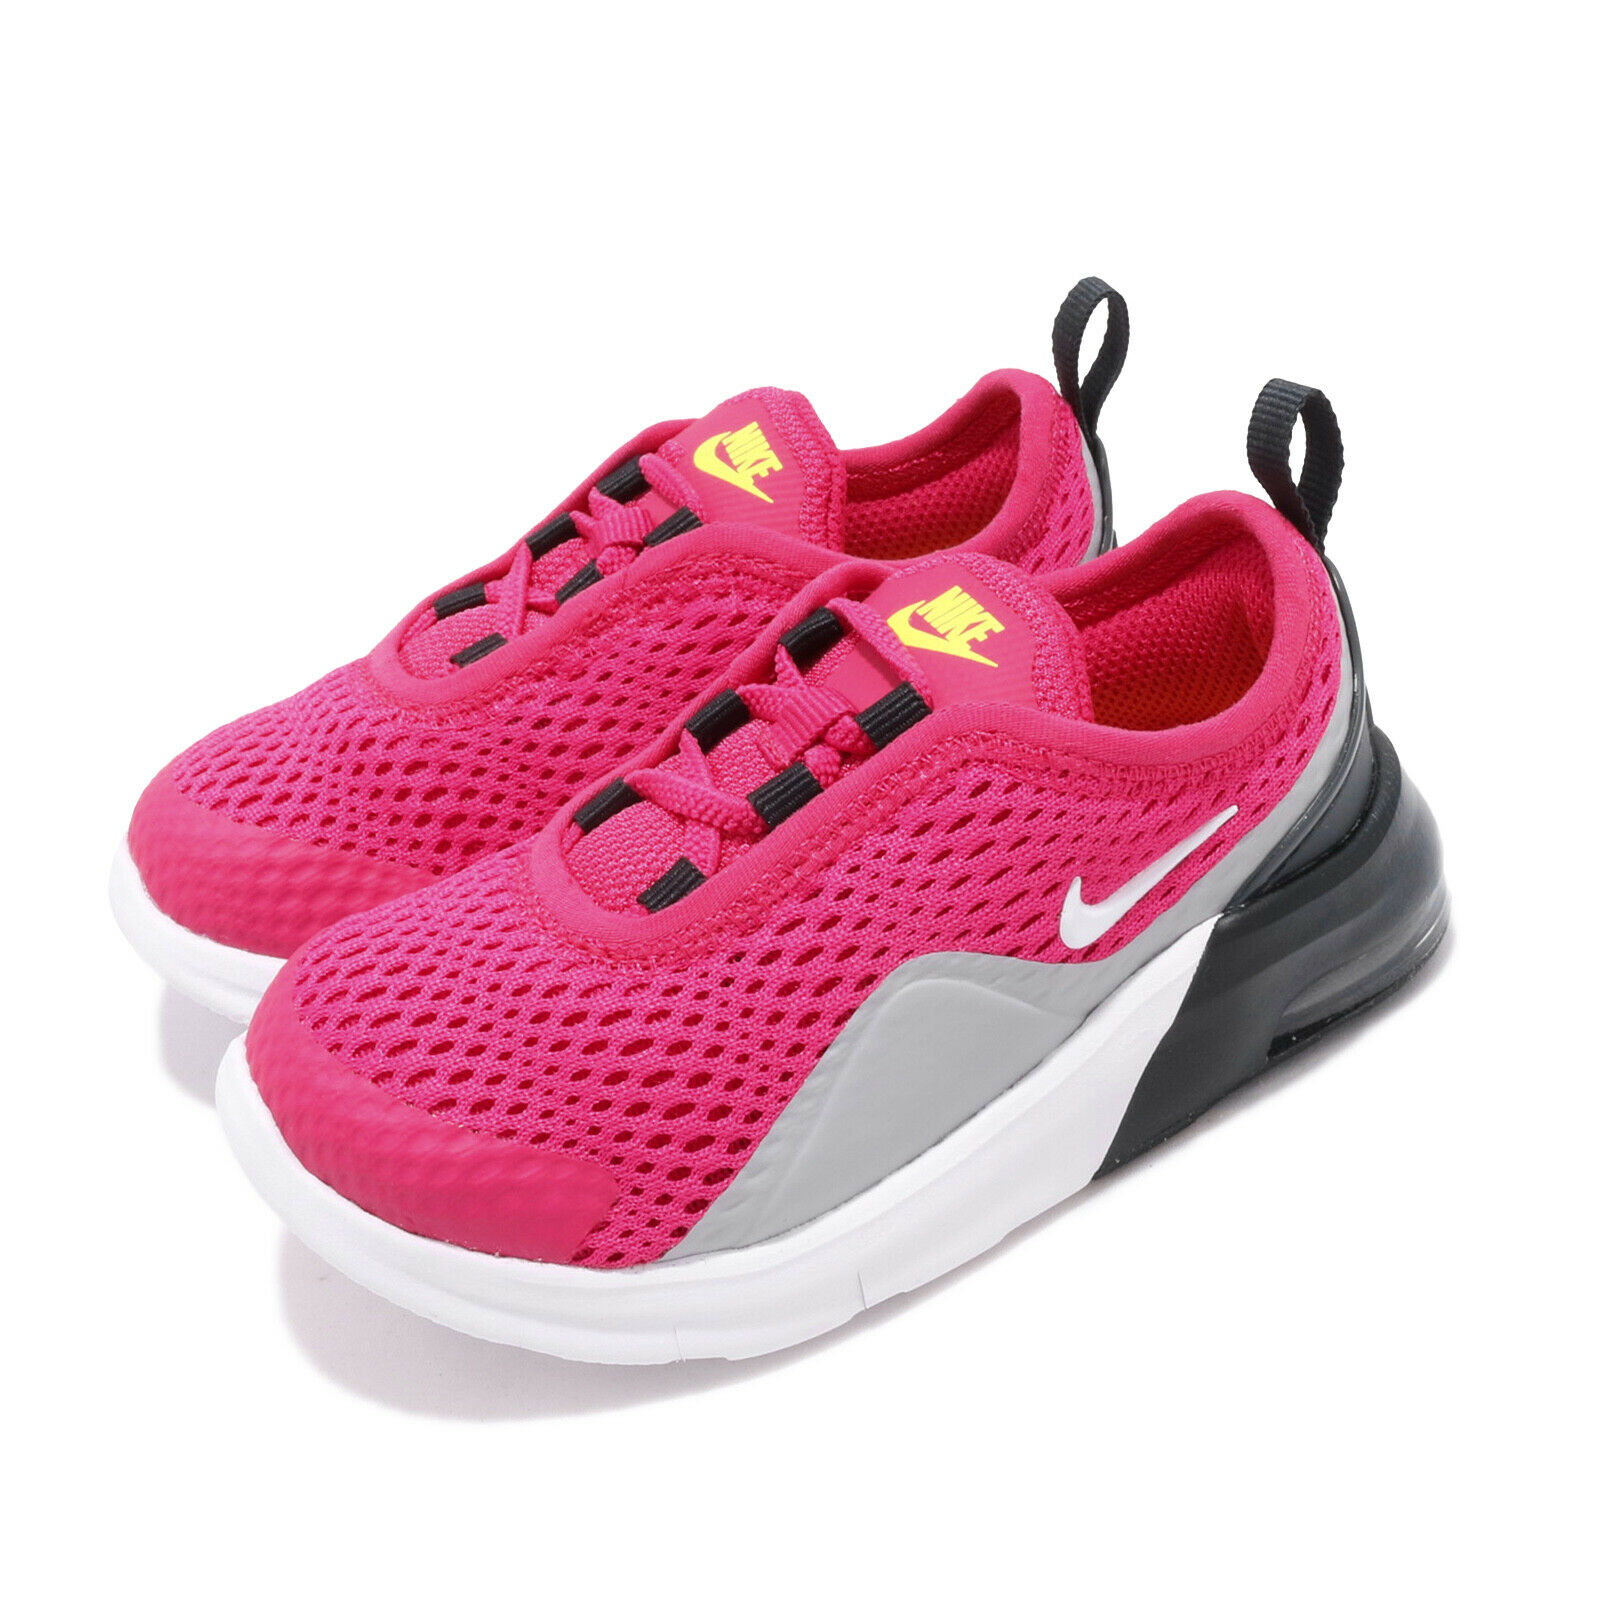 Nike Air Max  Motion 2 TDE Rush Pink White Grey Toddler Infant shoes AQ2744-600  low prices